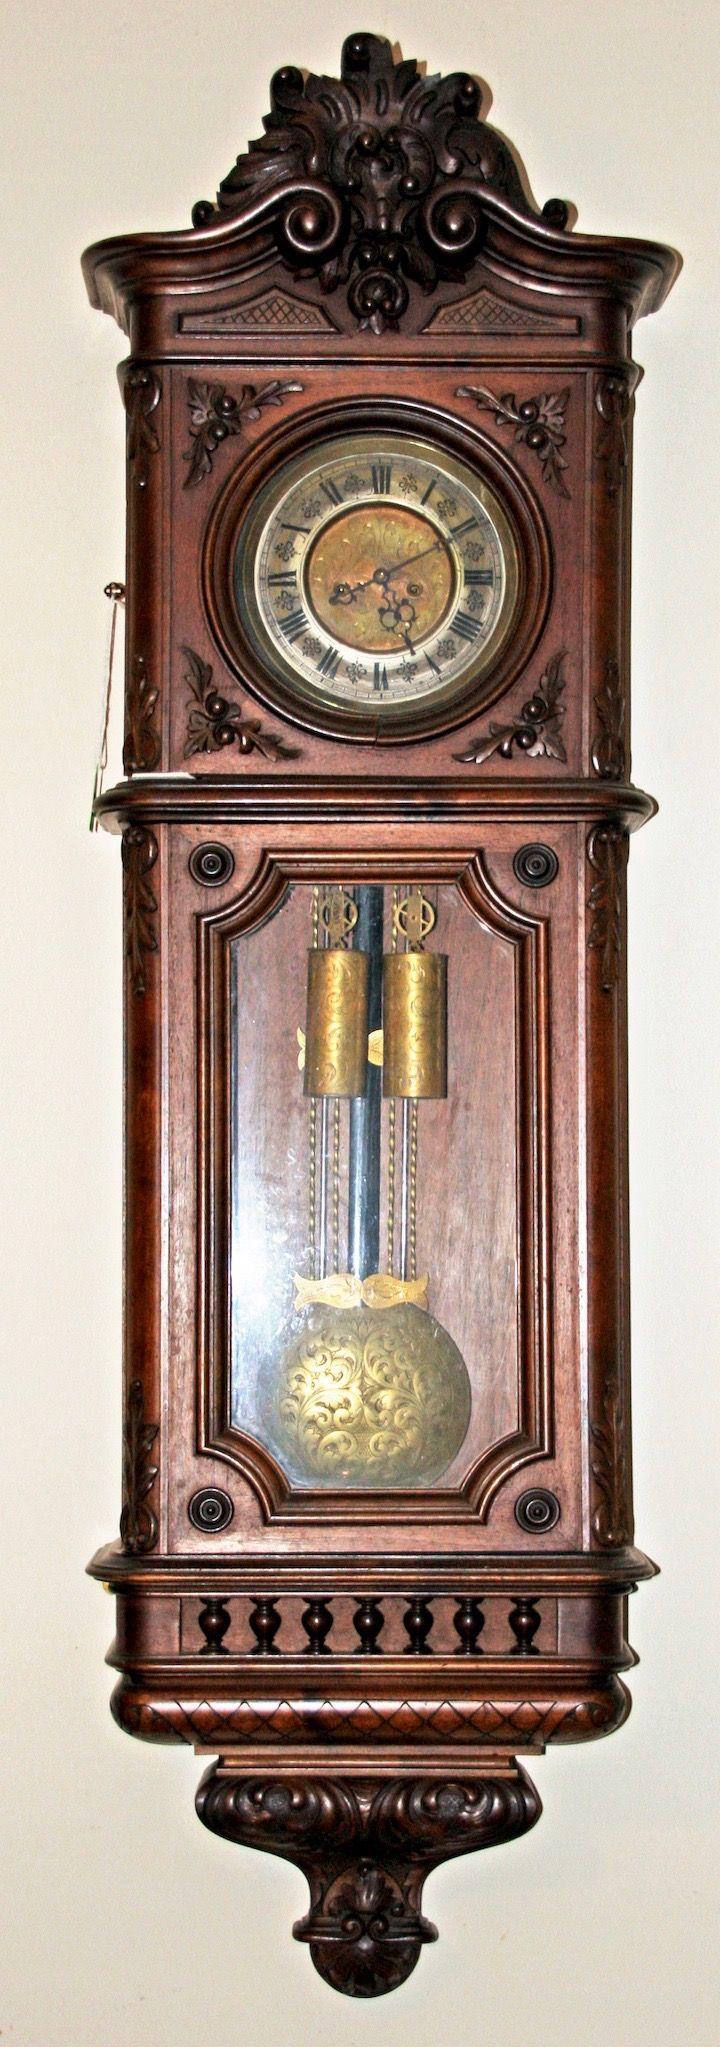 266 Best Clocks Images On Pinterest Antique Clocks